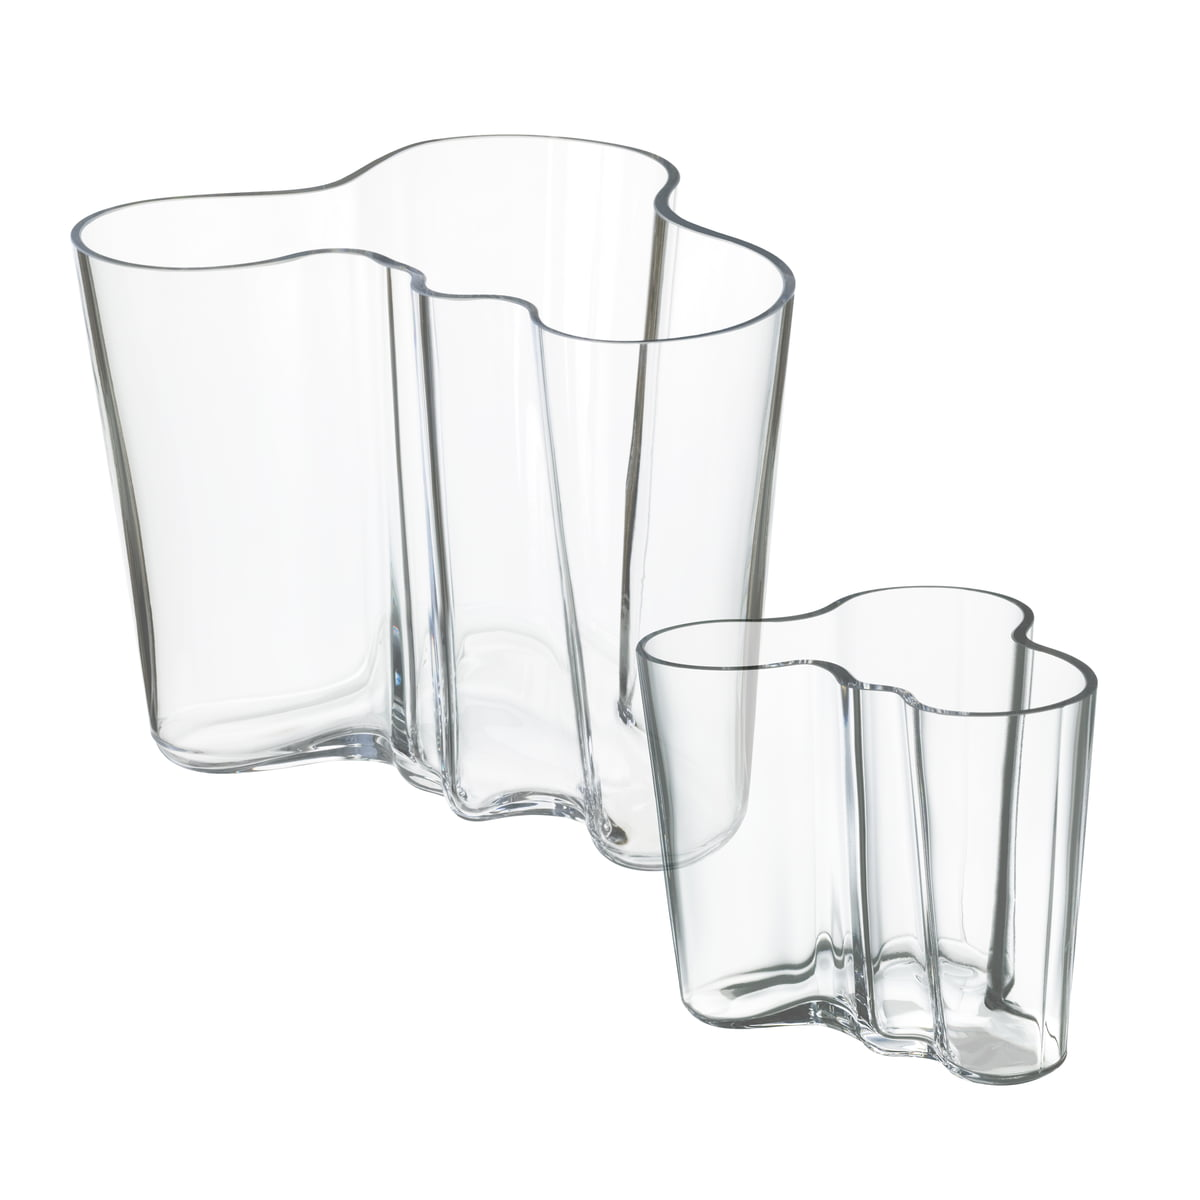 aalto vases gift set by iittala - offer alvar aalto vases set of   clear    mm